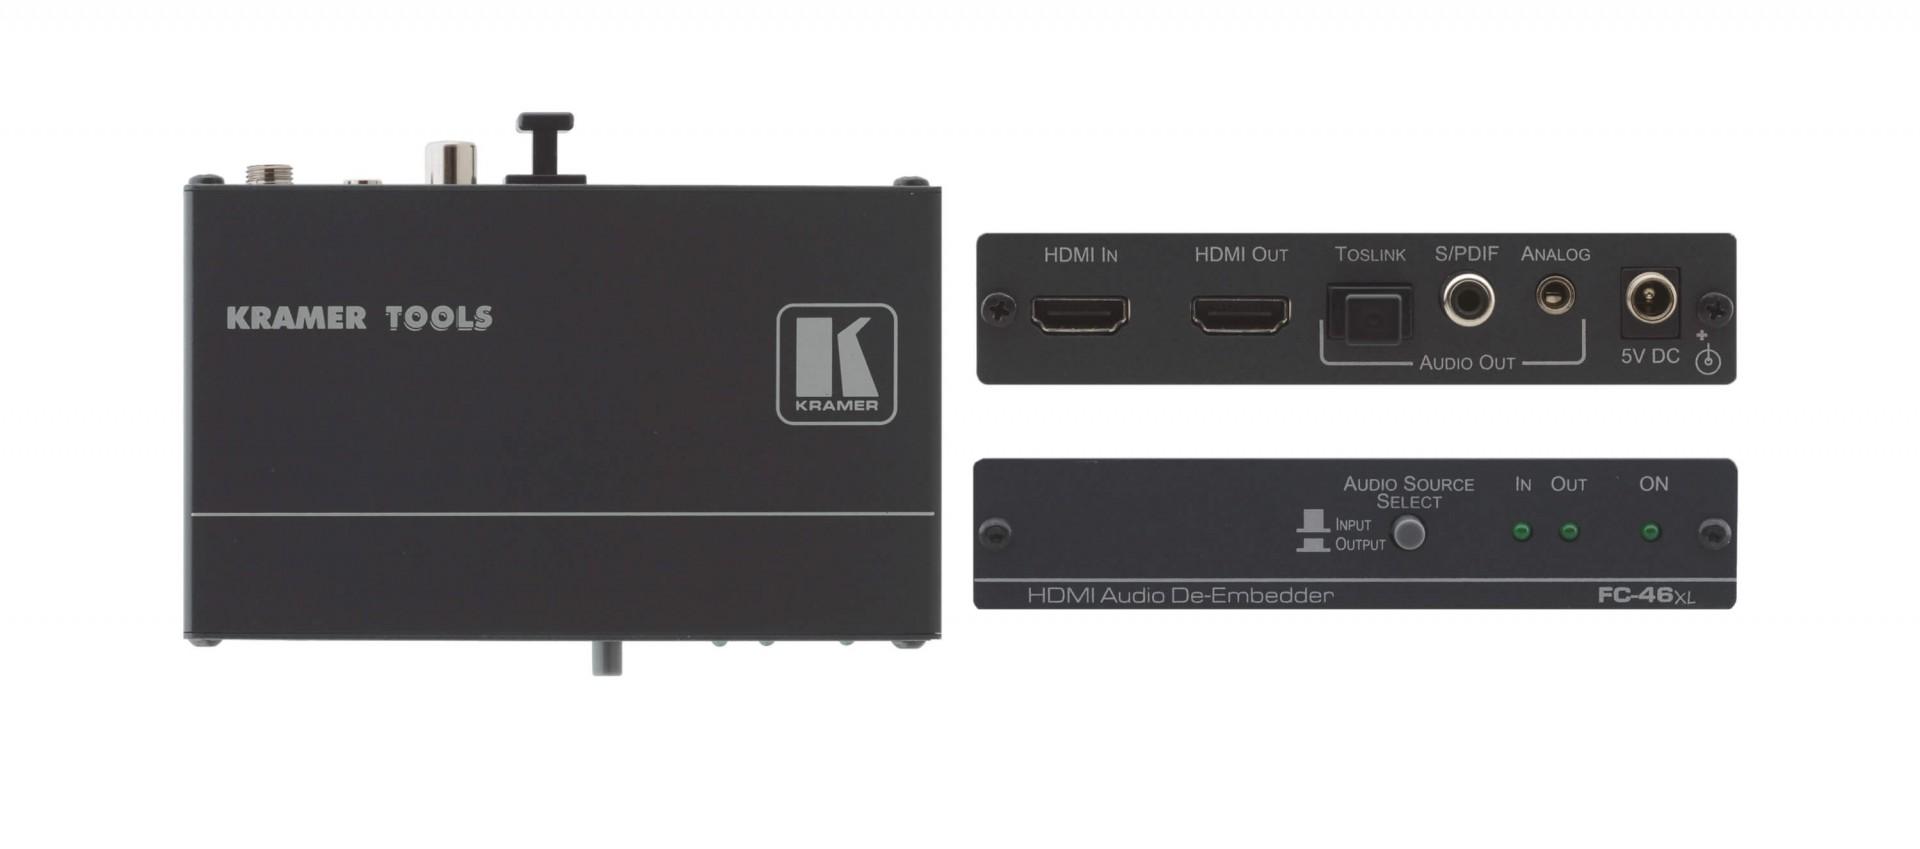 Kramer FC-46xl HDMI Audio De–Embedder